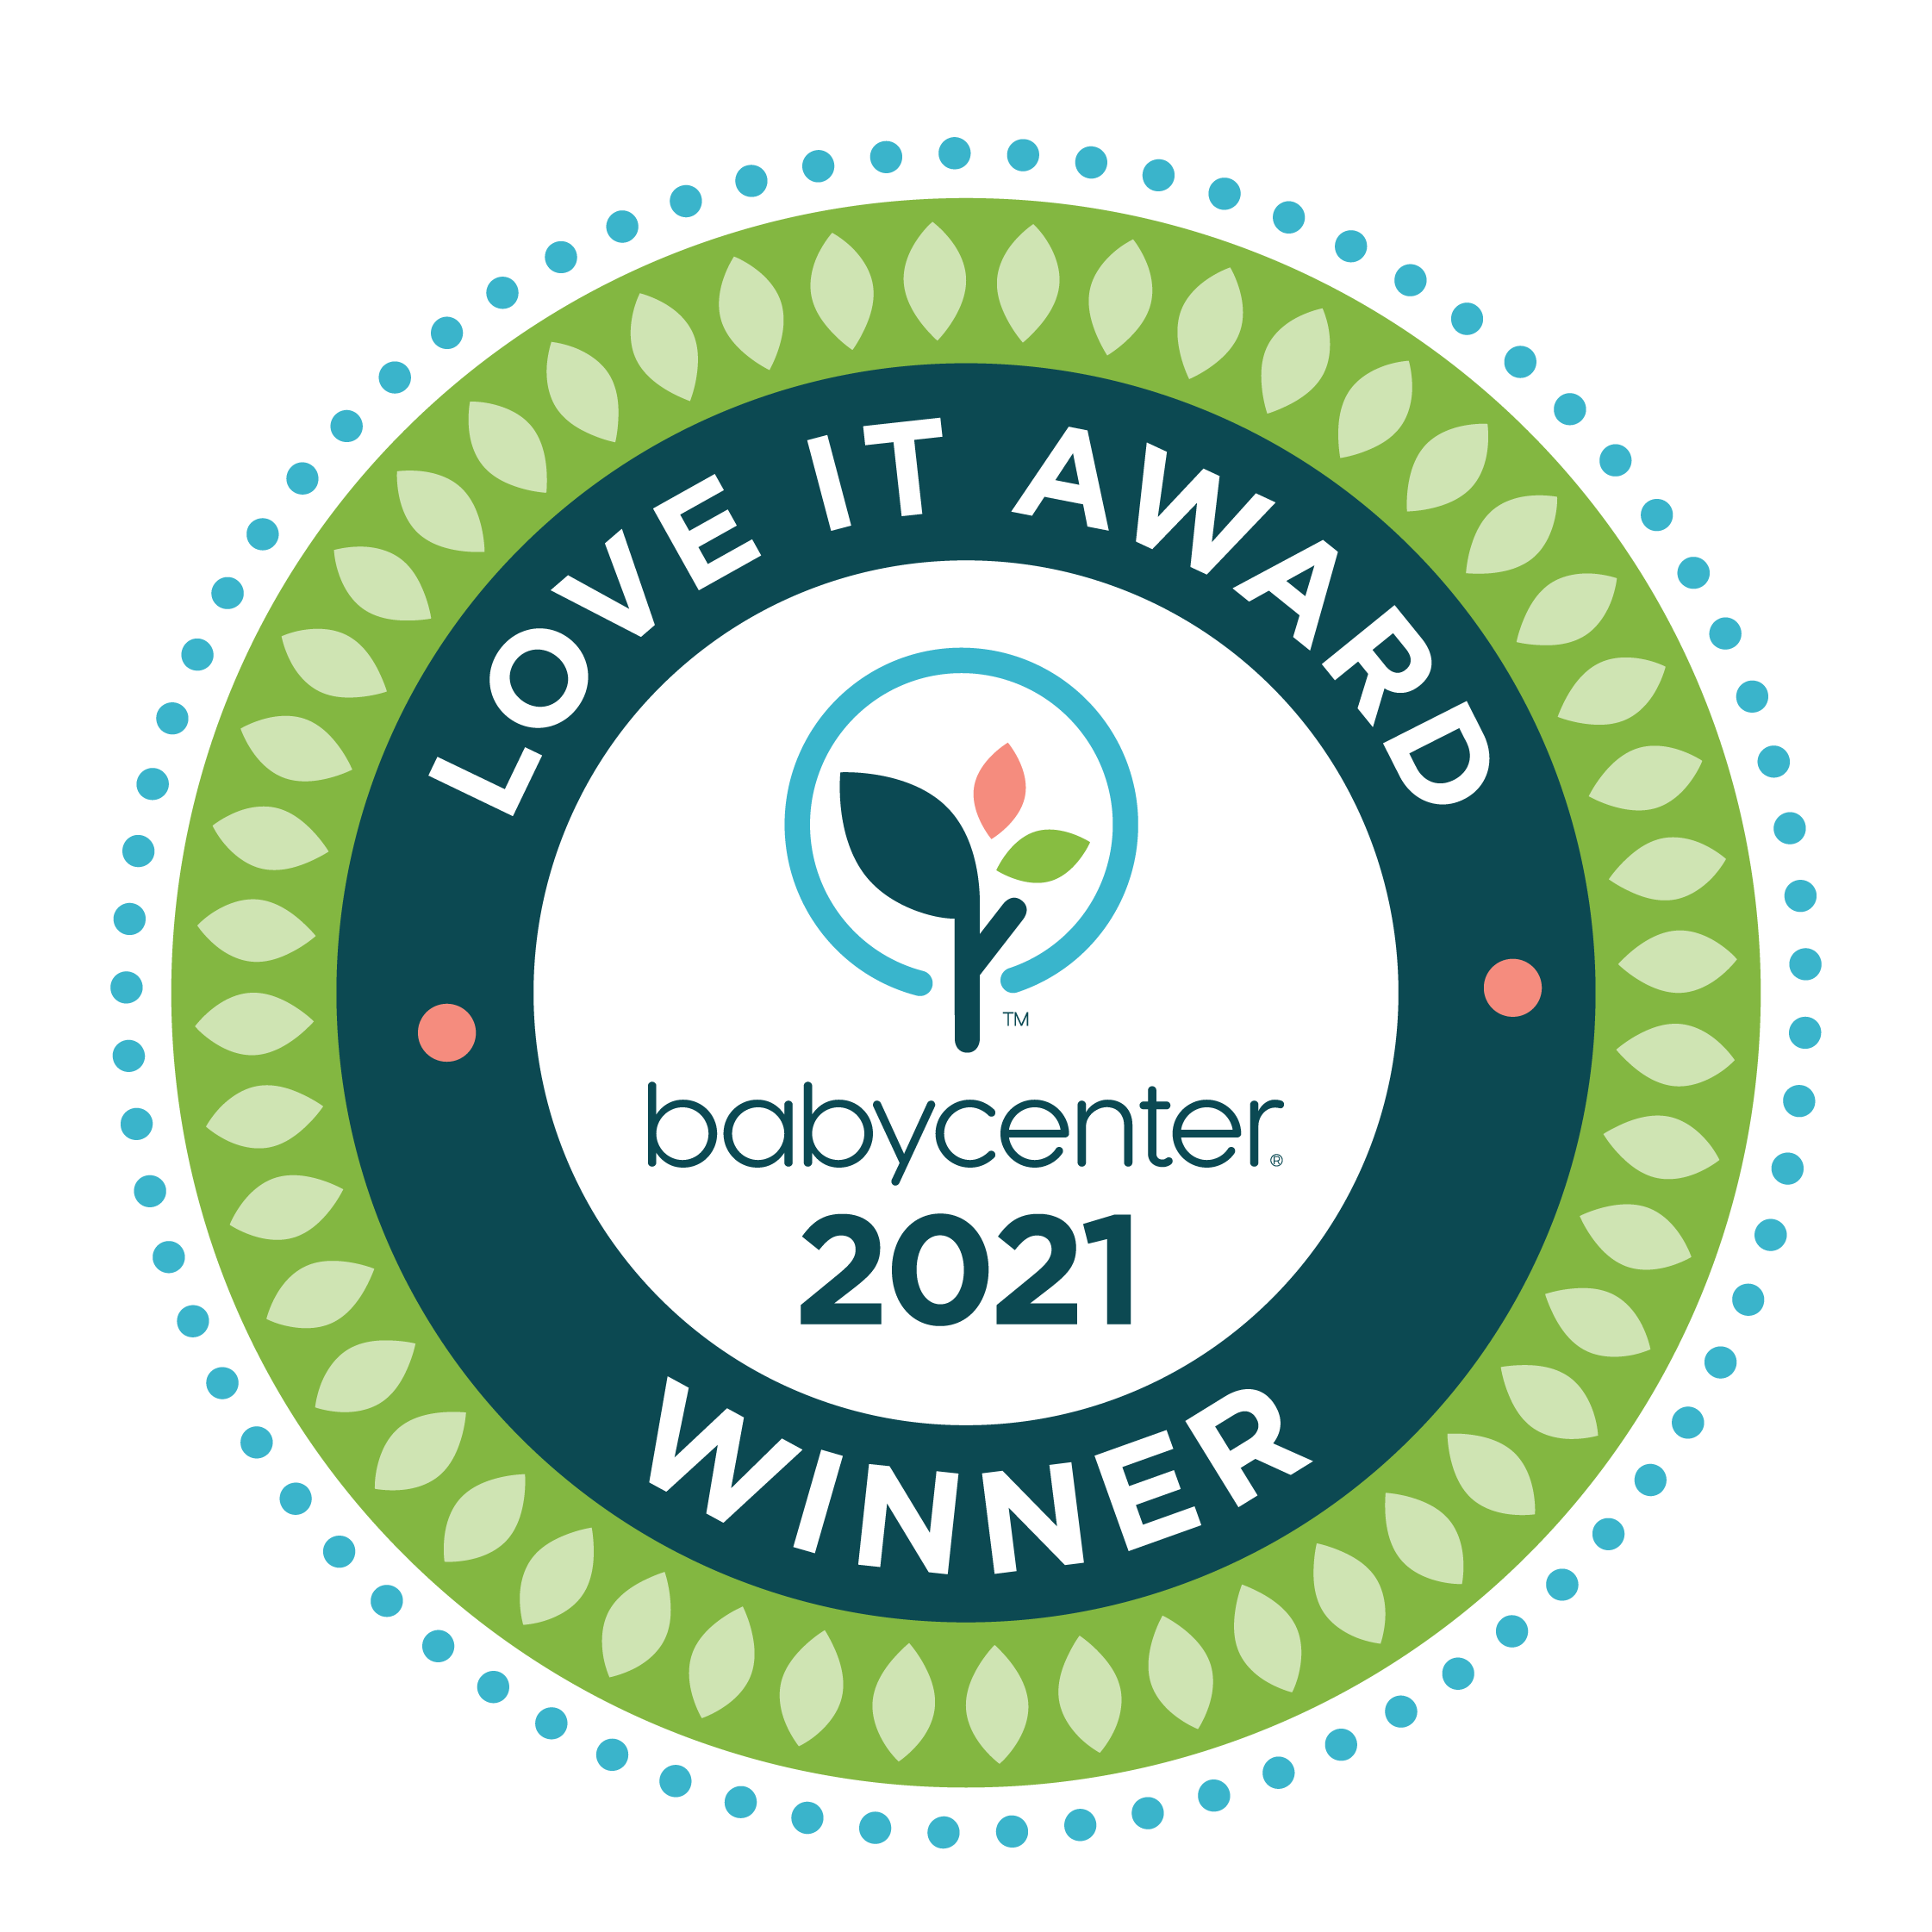 Babycentre – Love It Award Winner 2021